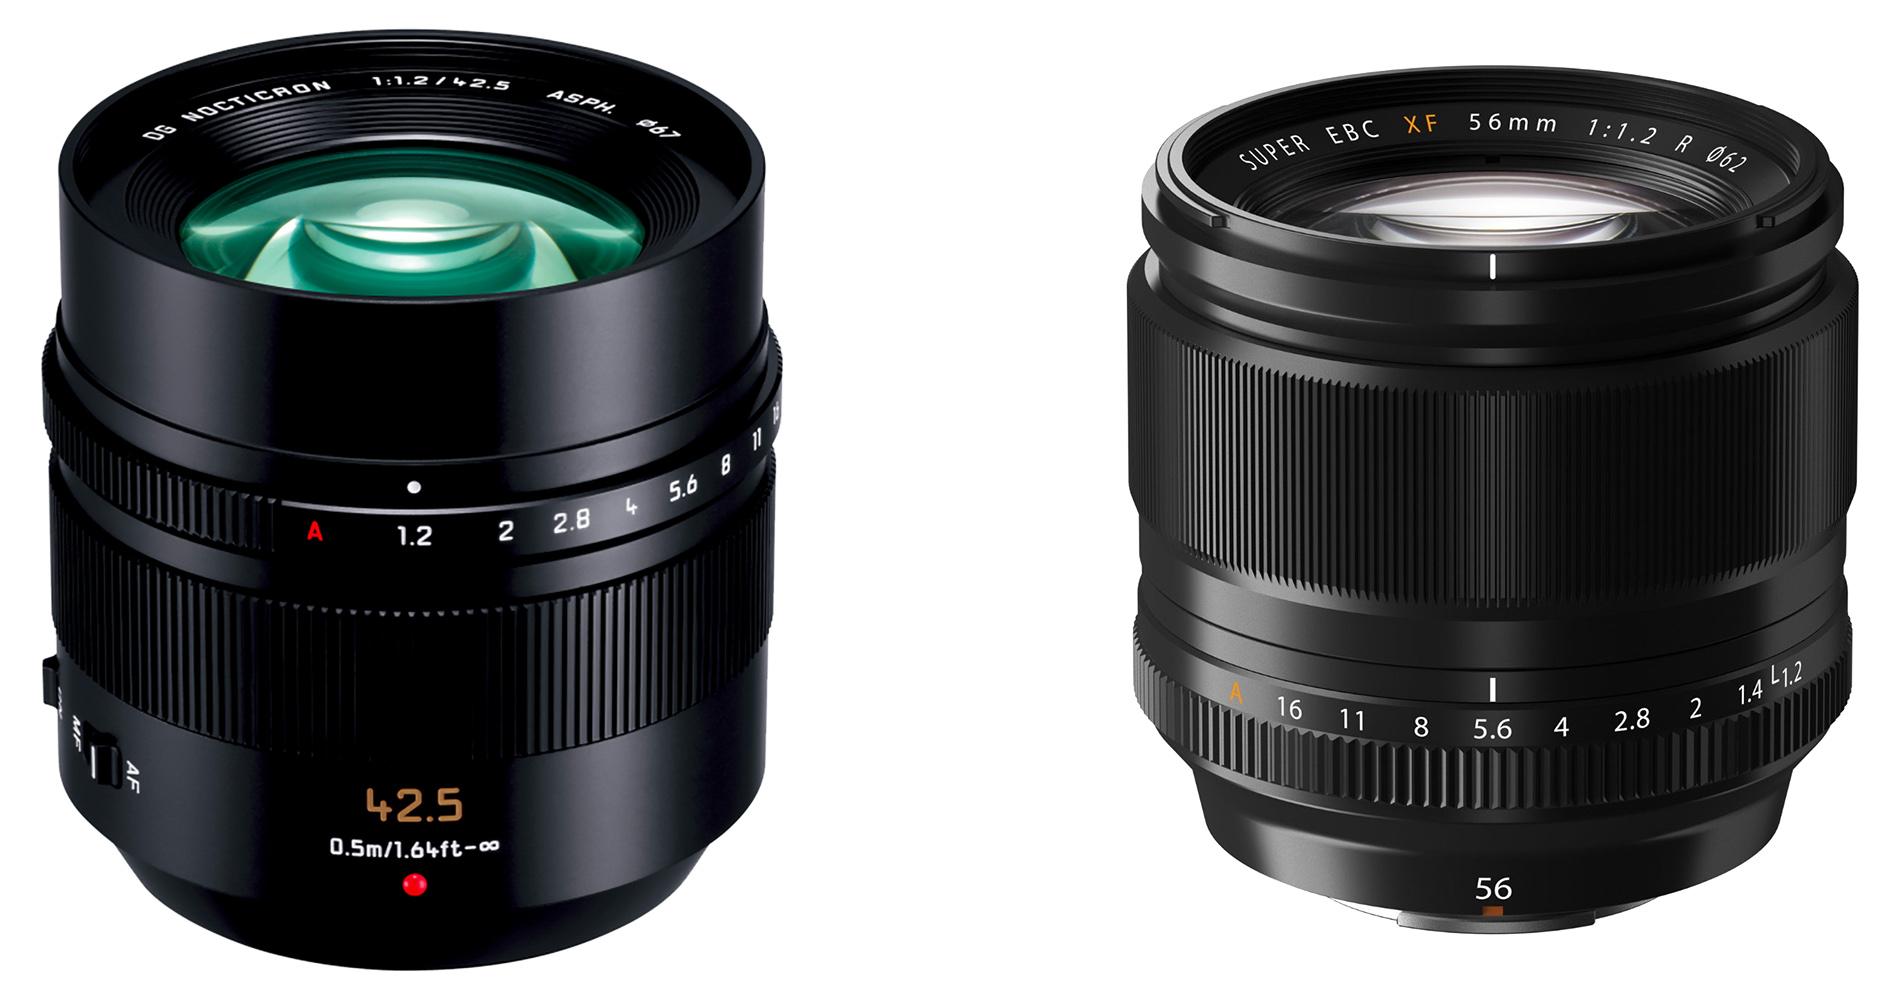 Leica Dg Nocticron 425mm F12 Asph Power Ois H Ns043 Panasonic Lumix G F 12 Xf56mmf12 R